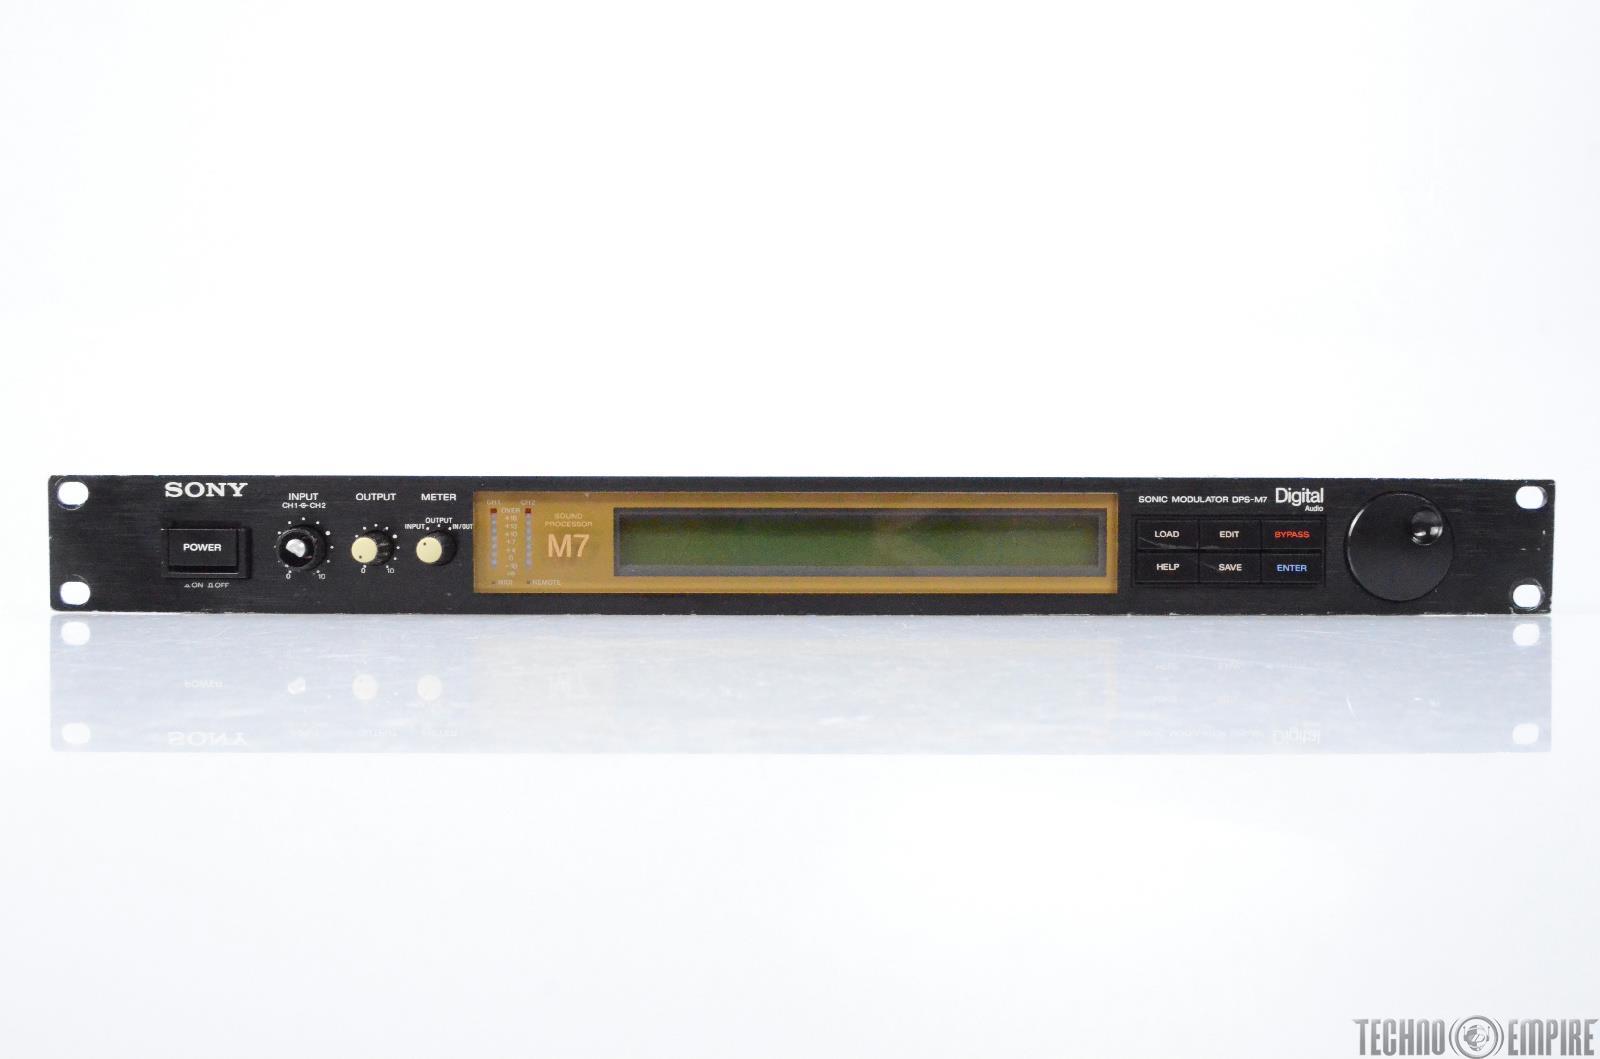 Sony DPS M7 Sonic Modulator Digital Sound Processor #28378